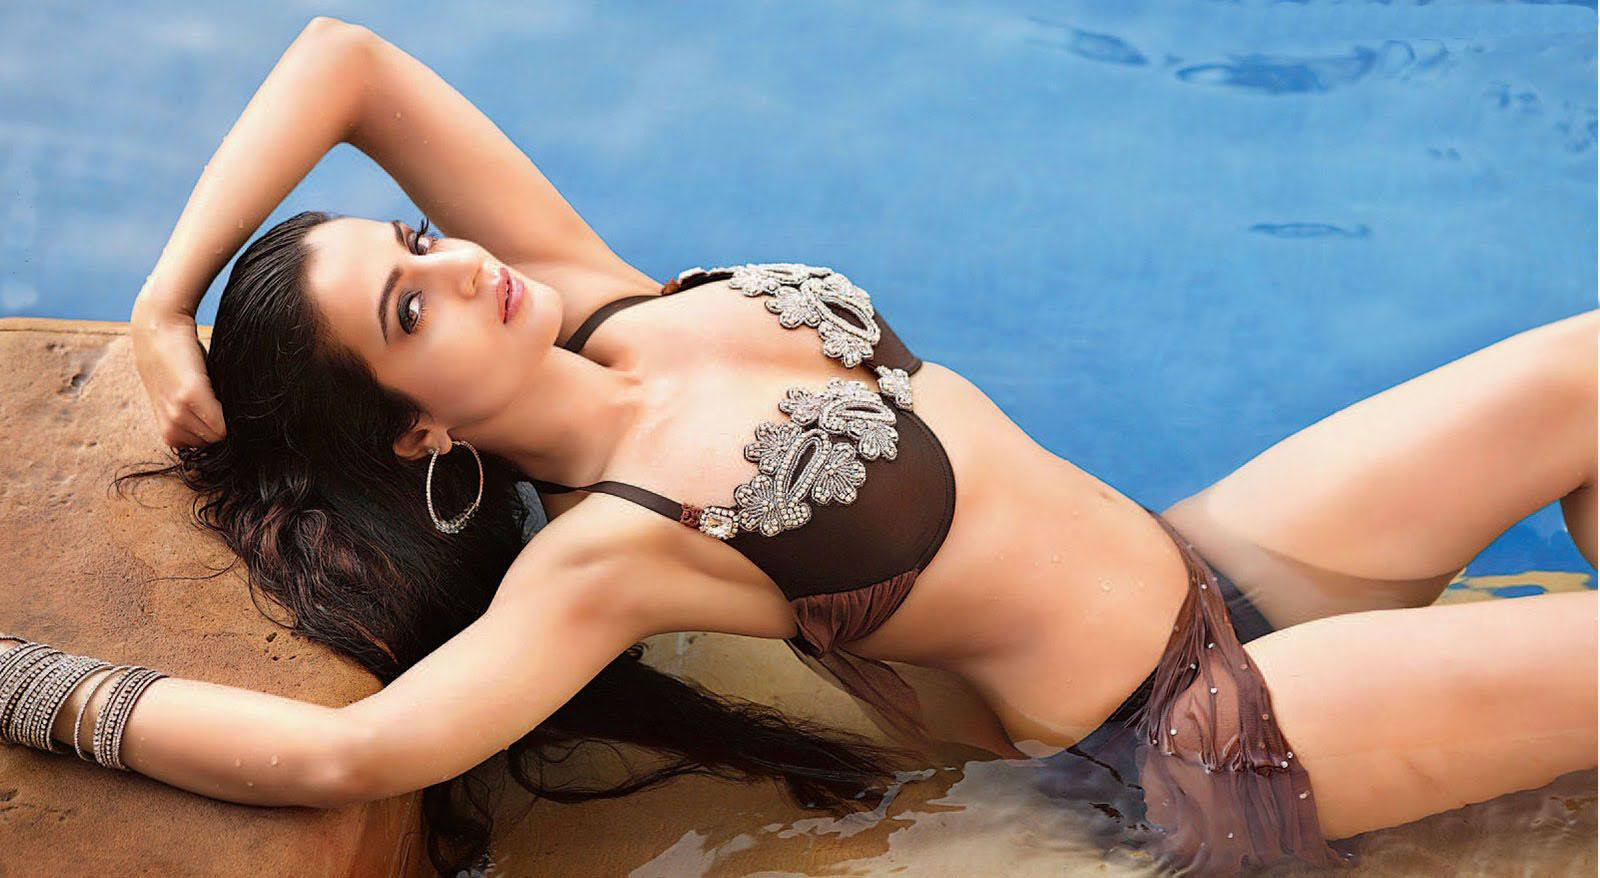 katrina kaif hot pics without clothes images bollywood movie